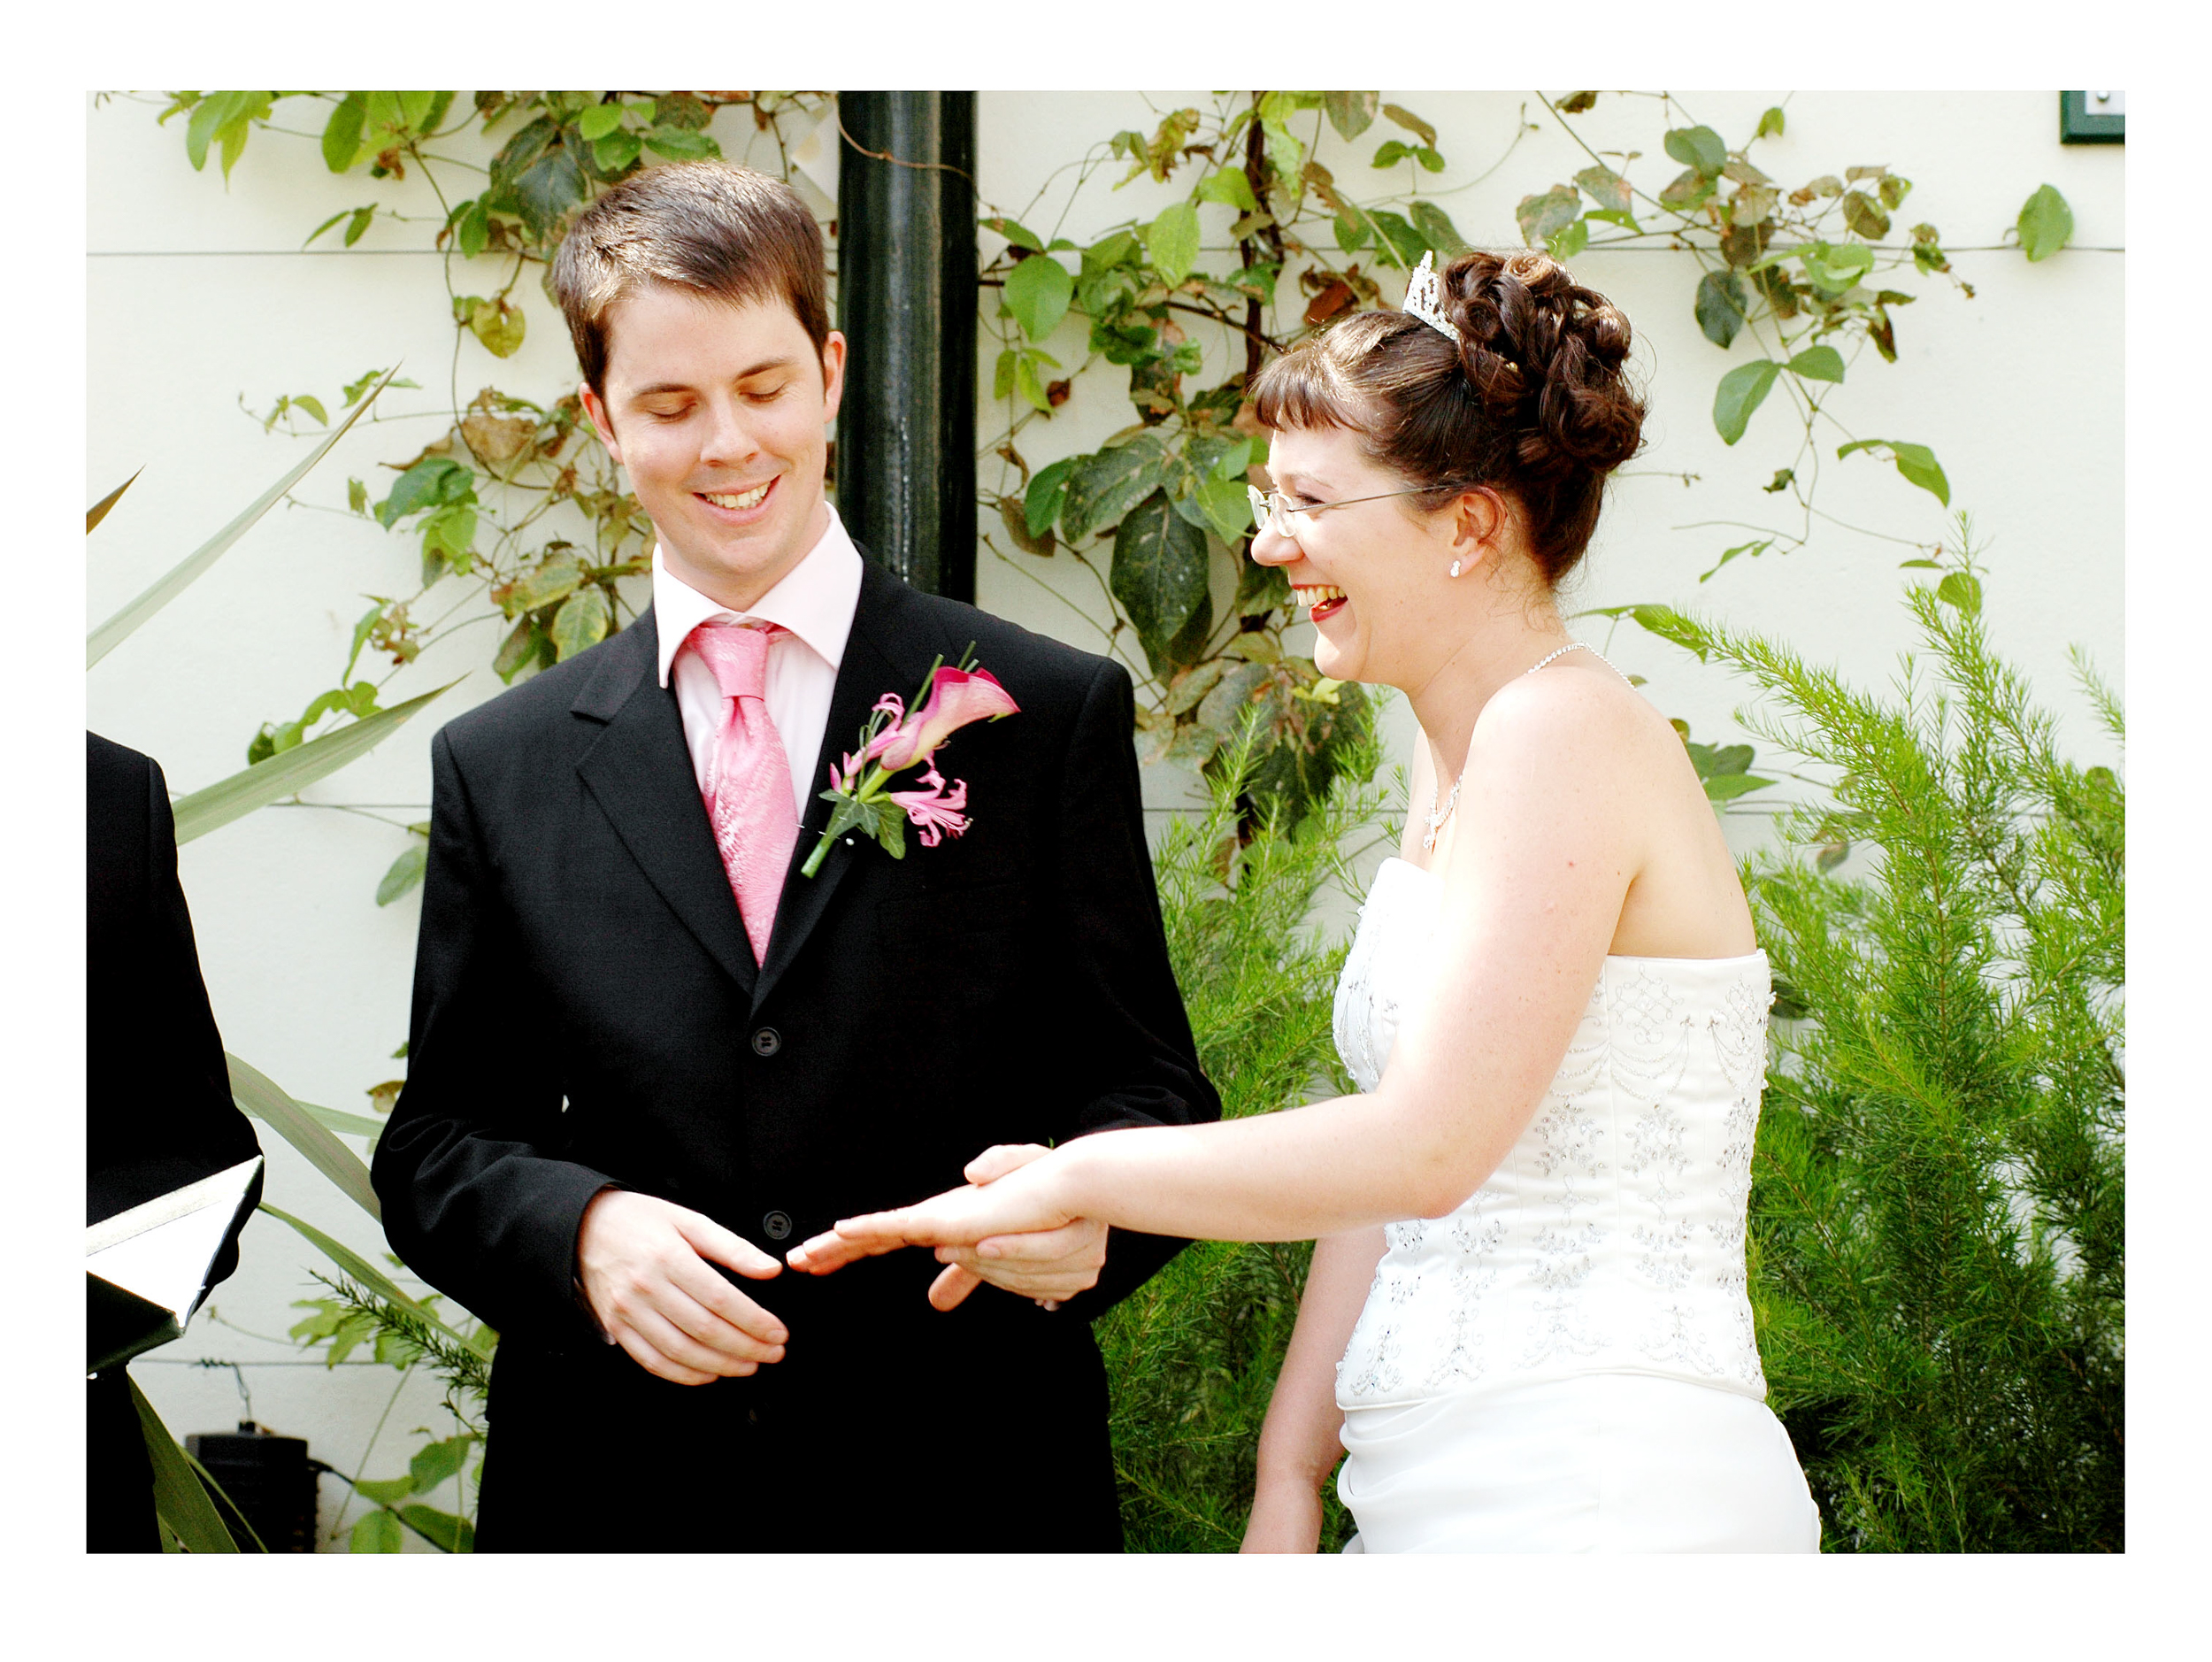 REPORTAGE-WEDDING-PHOTOGRAPHY-SET-UK-15.jpg